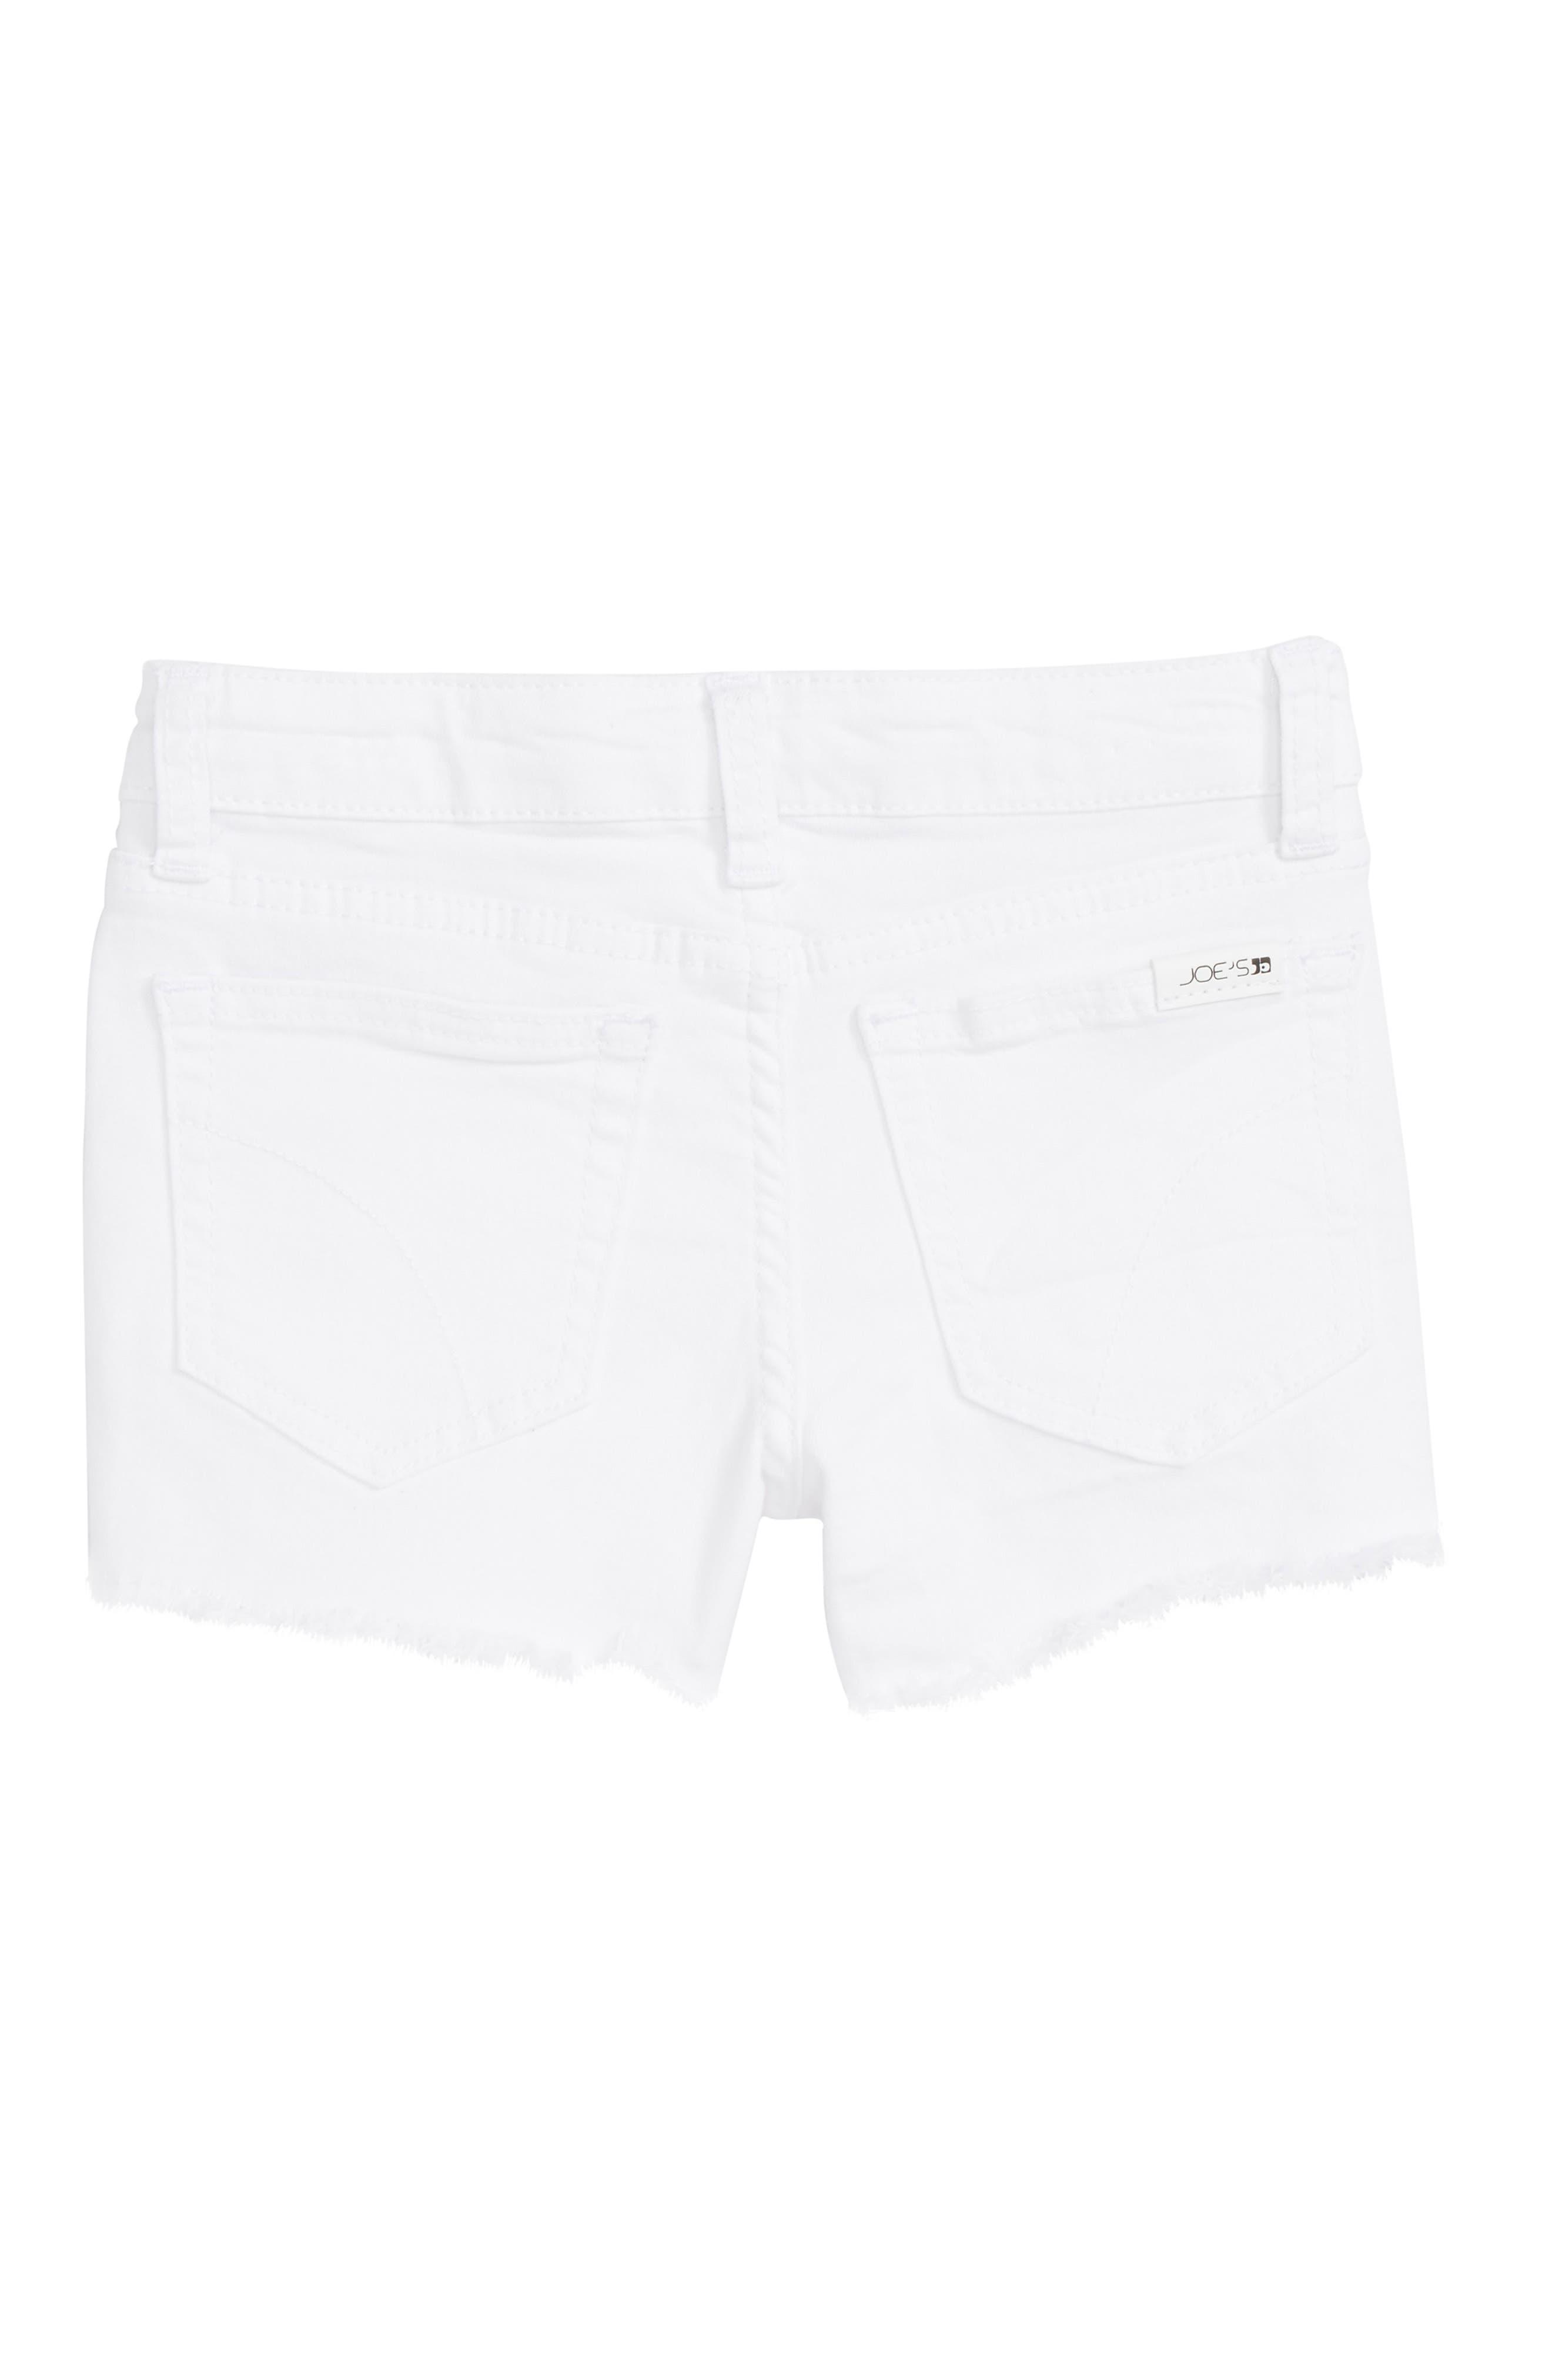 Markie Cutoff Denim Shorts,                             Alternate thumbnail 4, color,